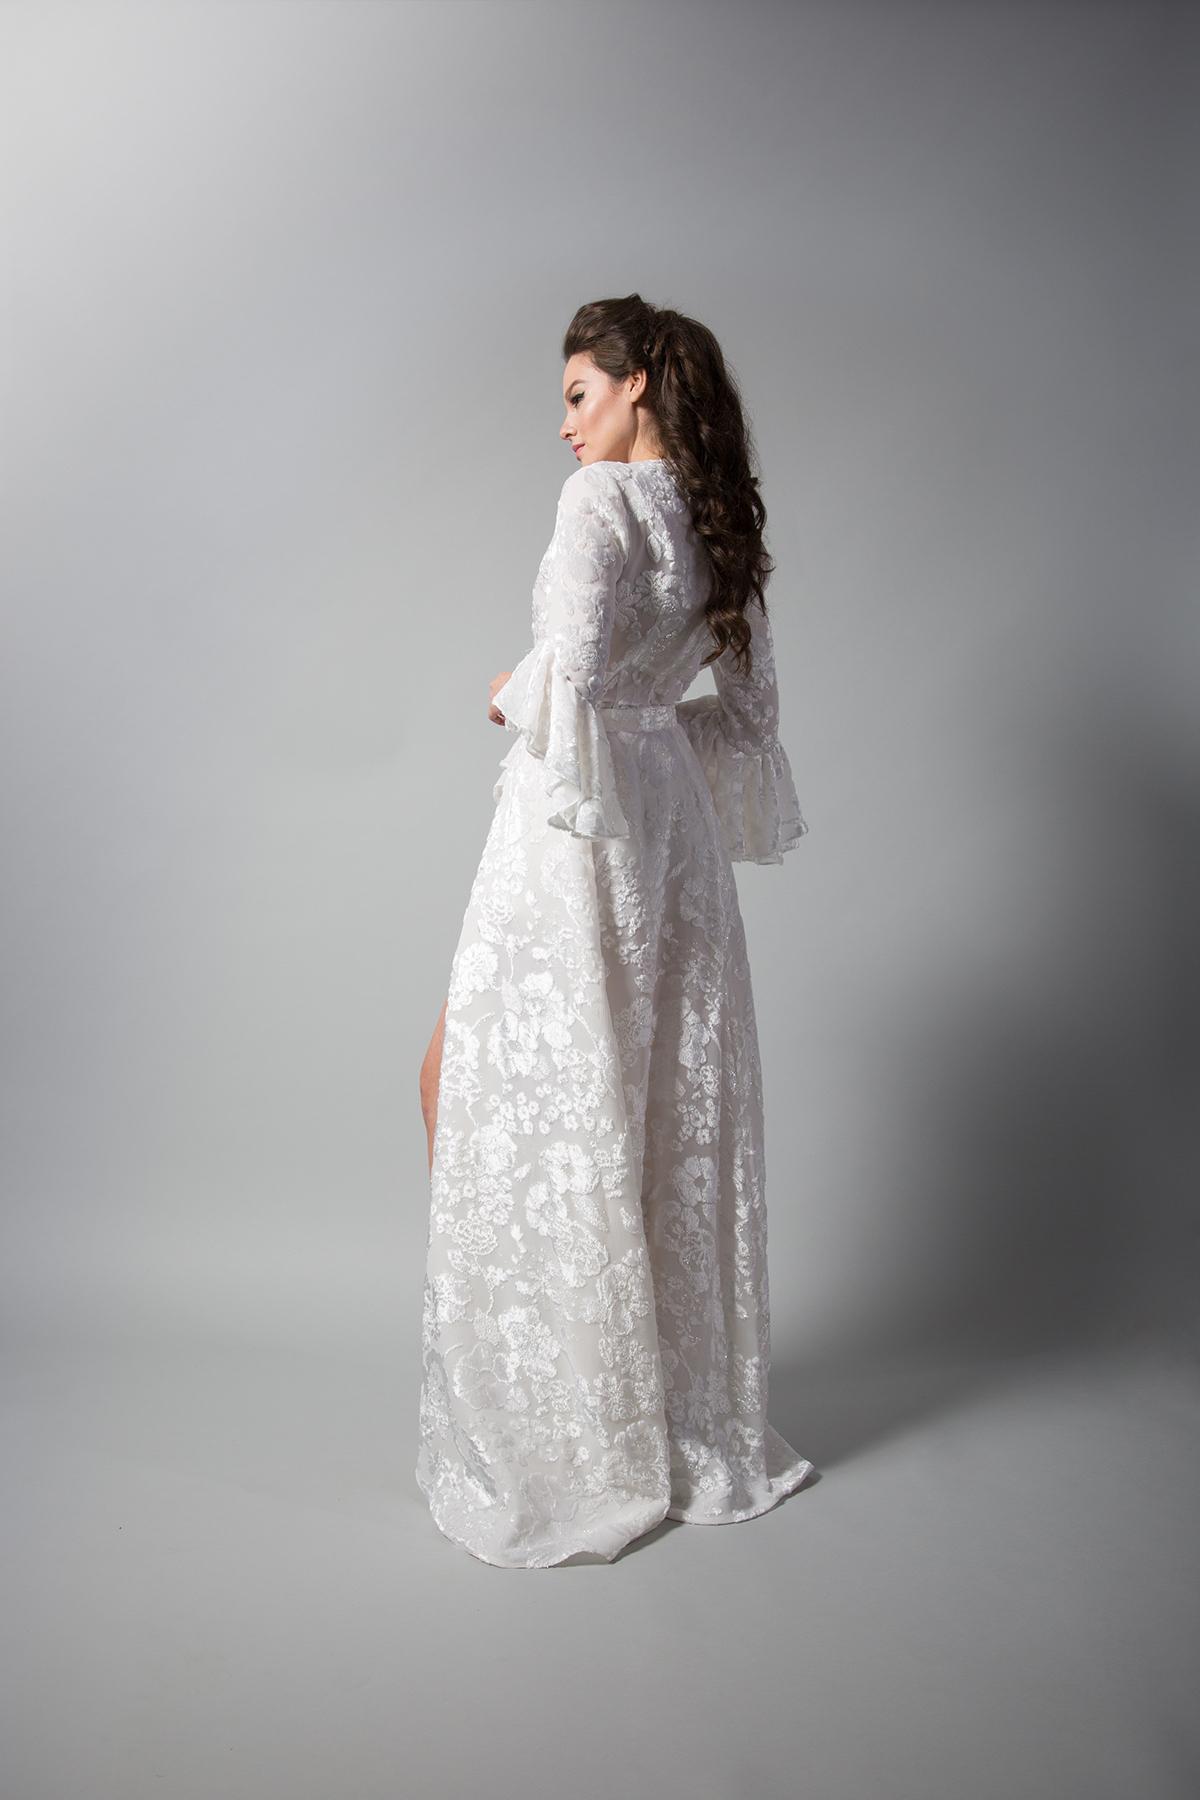 Randi Rahm: Style-Scarlet-w-Jo-skirt